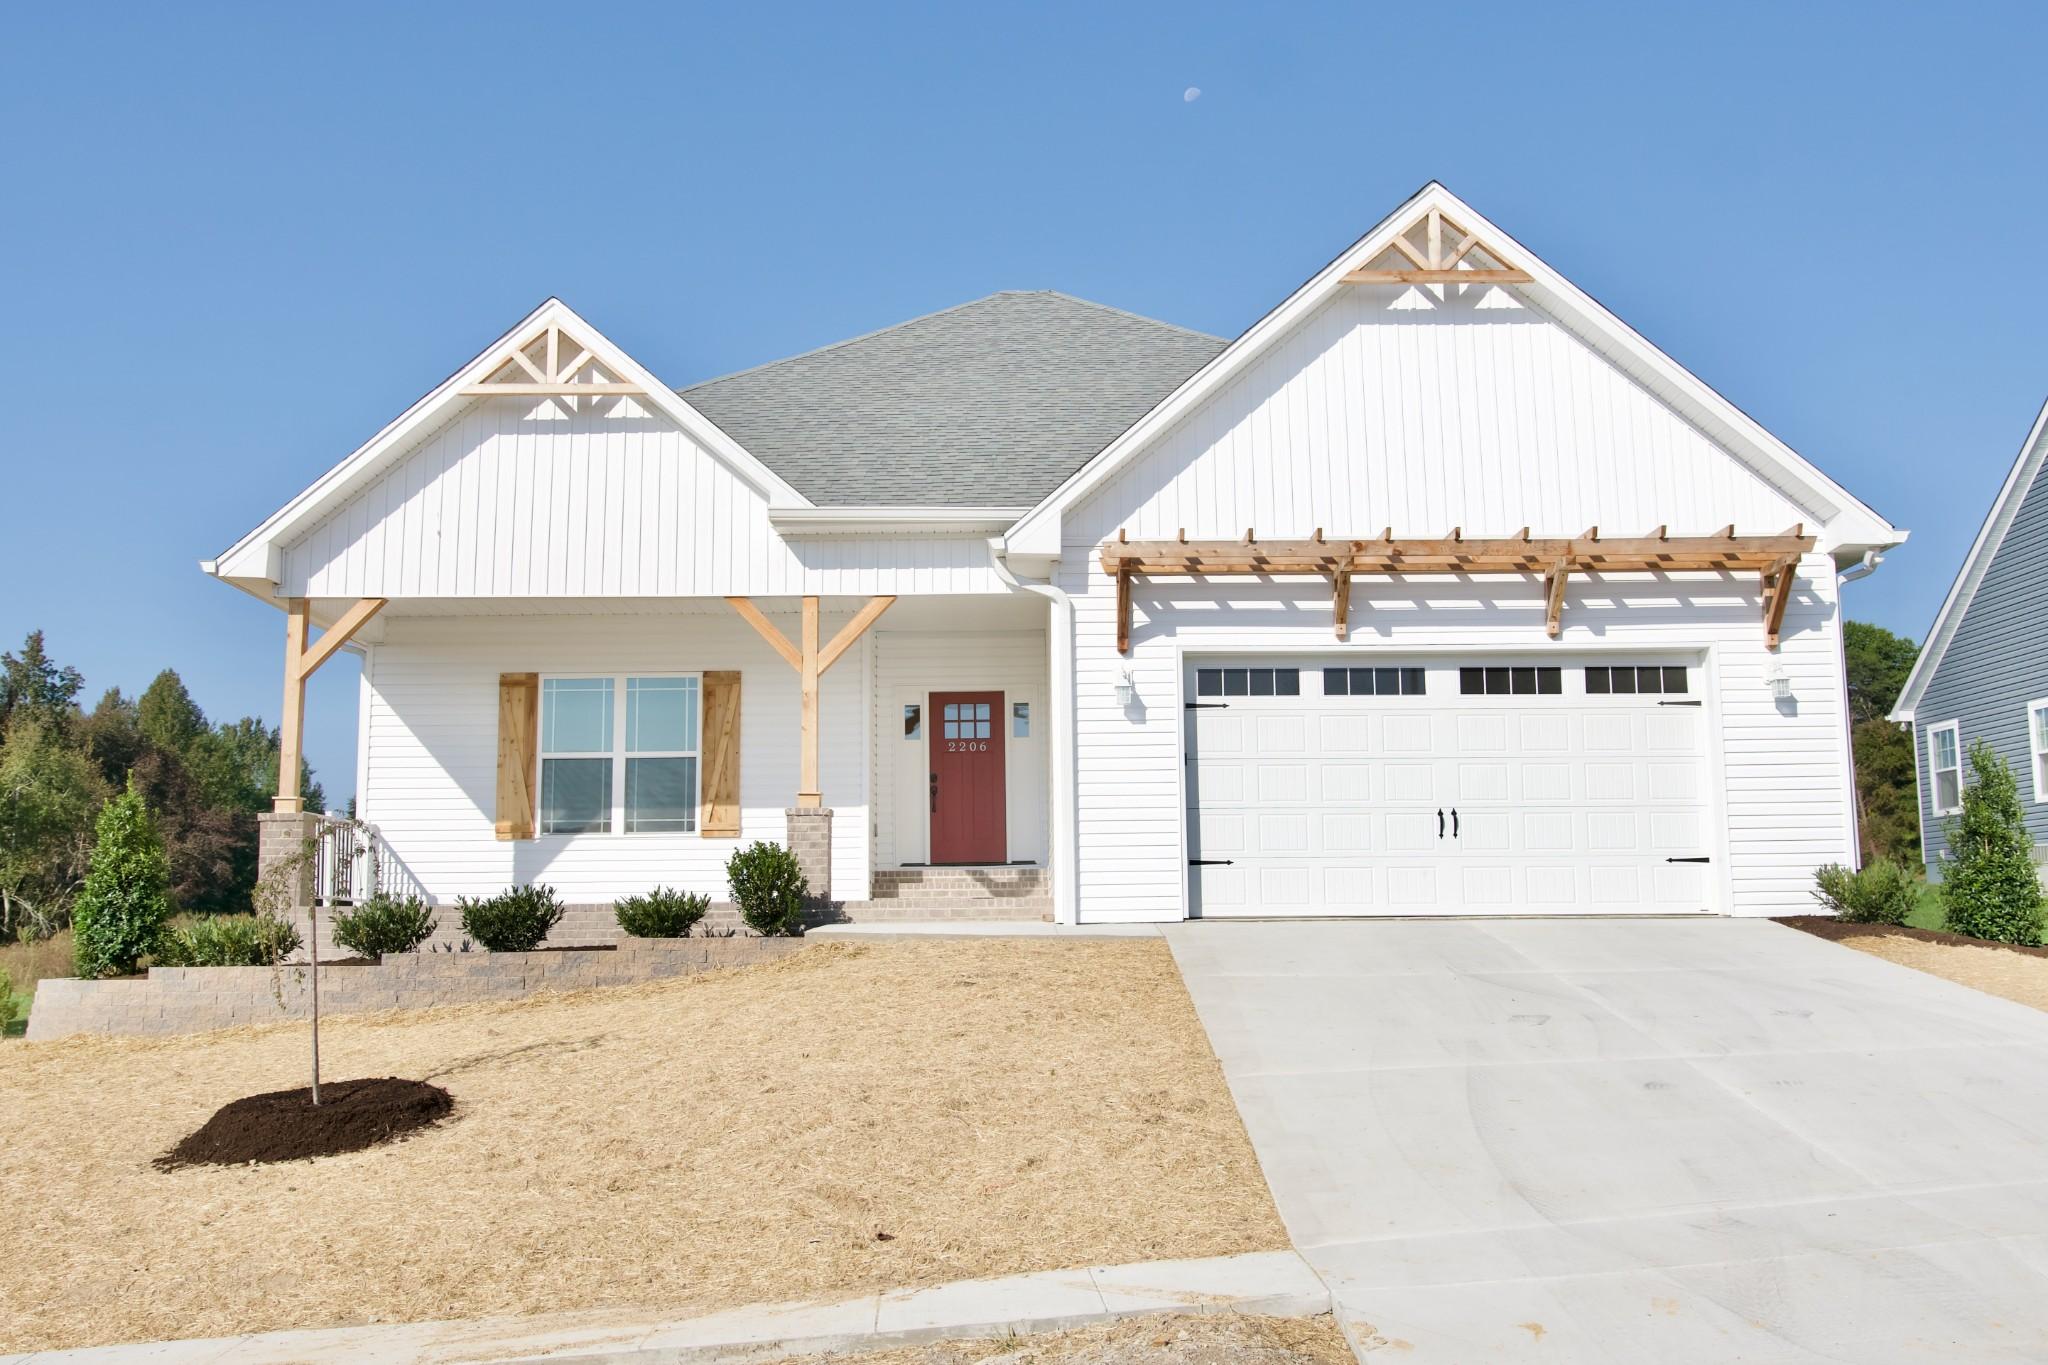 2206 Candyland Dr Property Photo - Cookeville, TN real estate listing